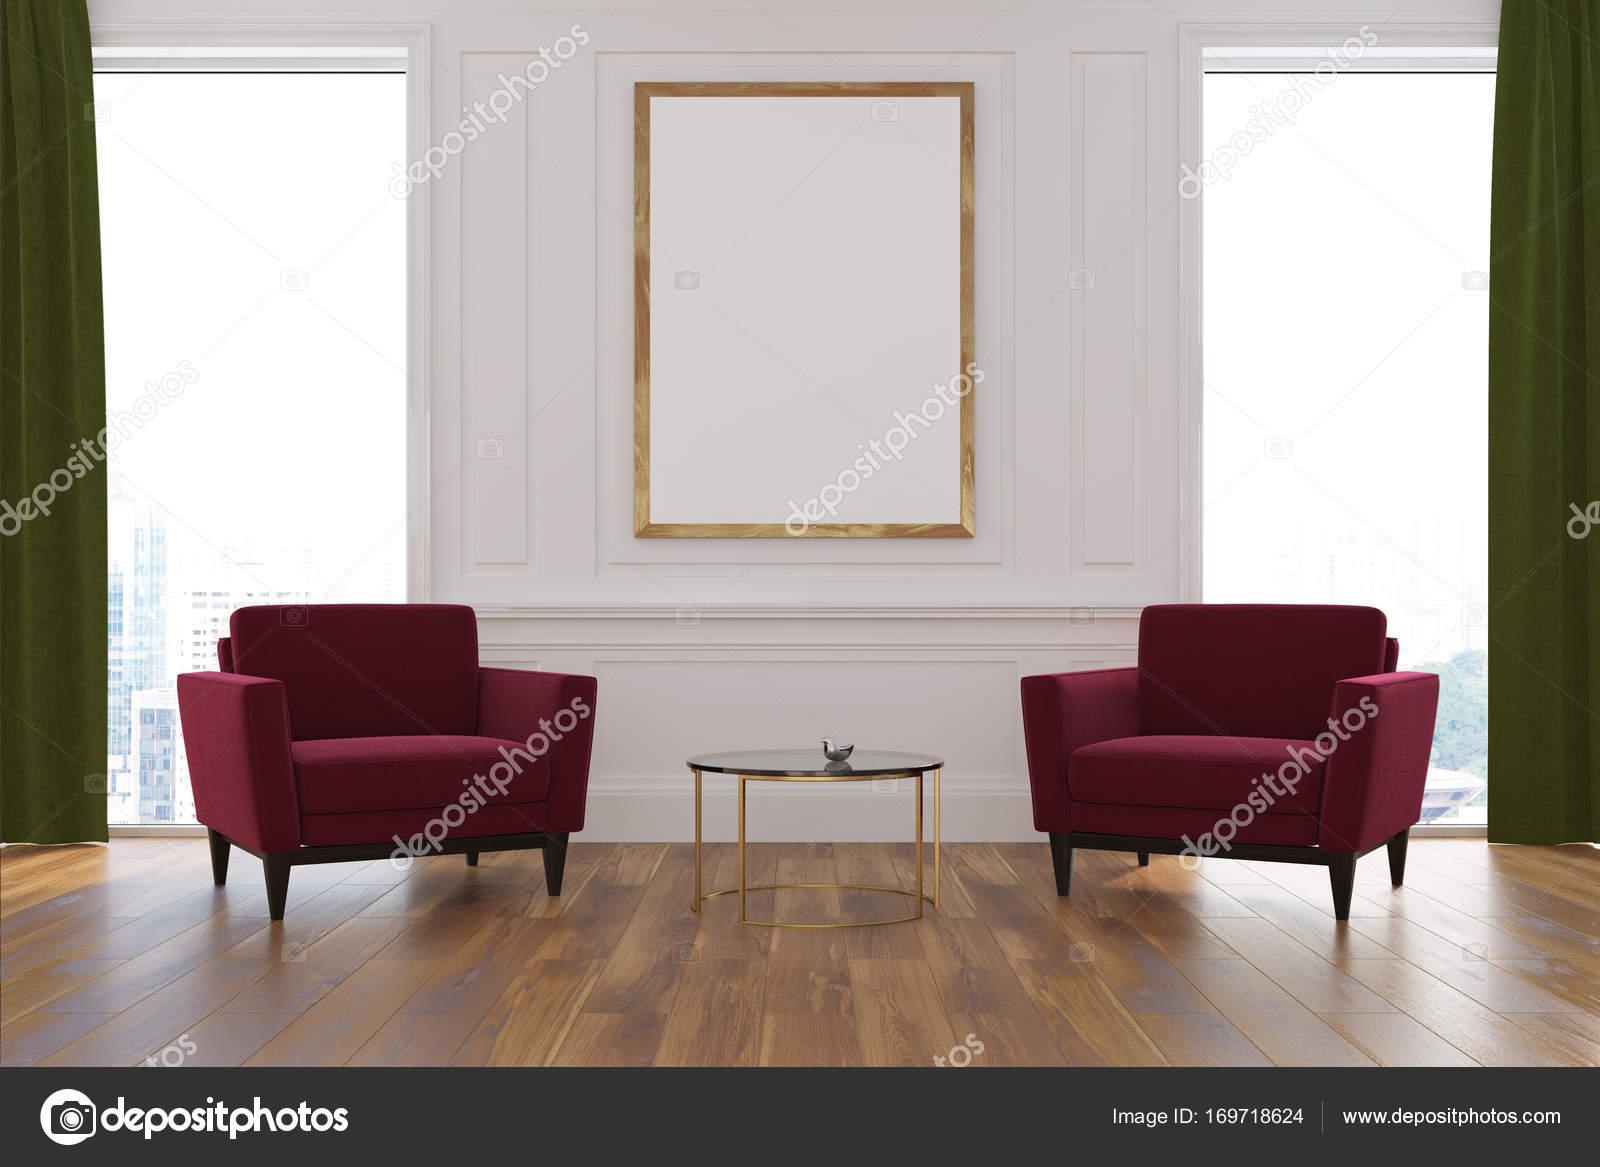 Wit woonkamer, Fauteuils, poster — Stockfoto © denisismagilov #169718624